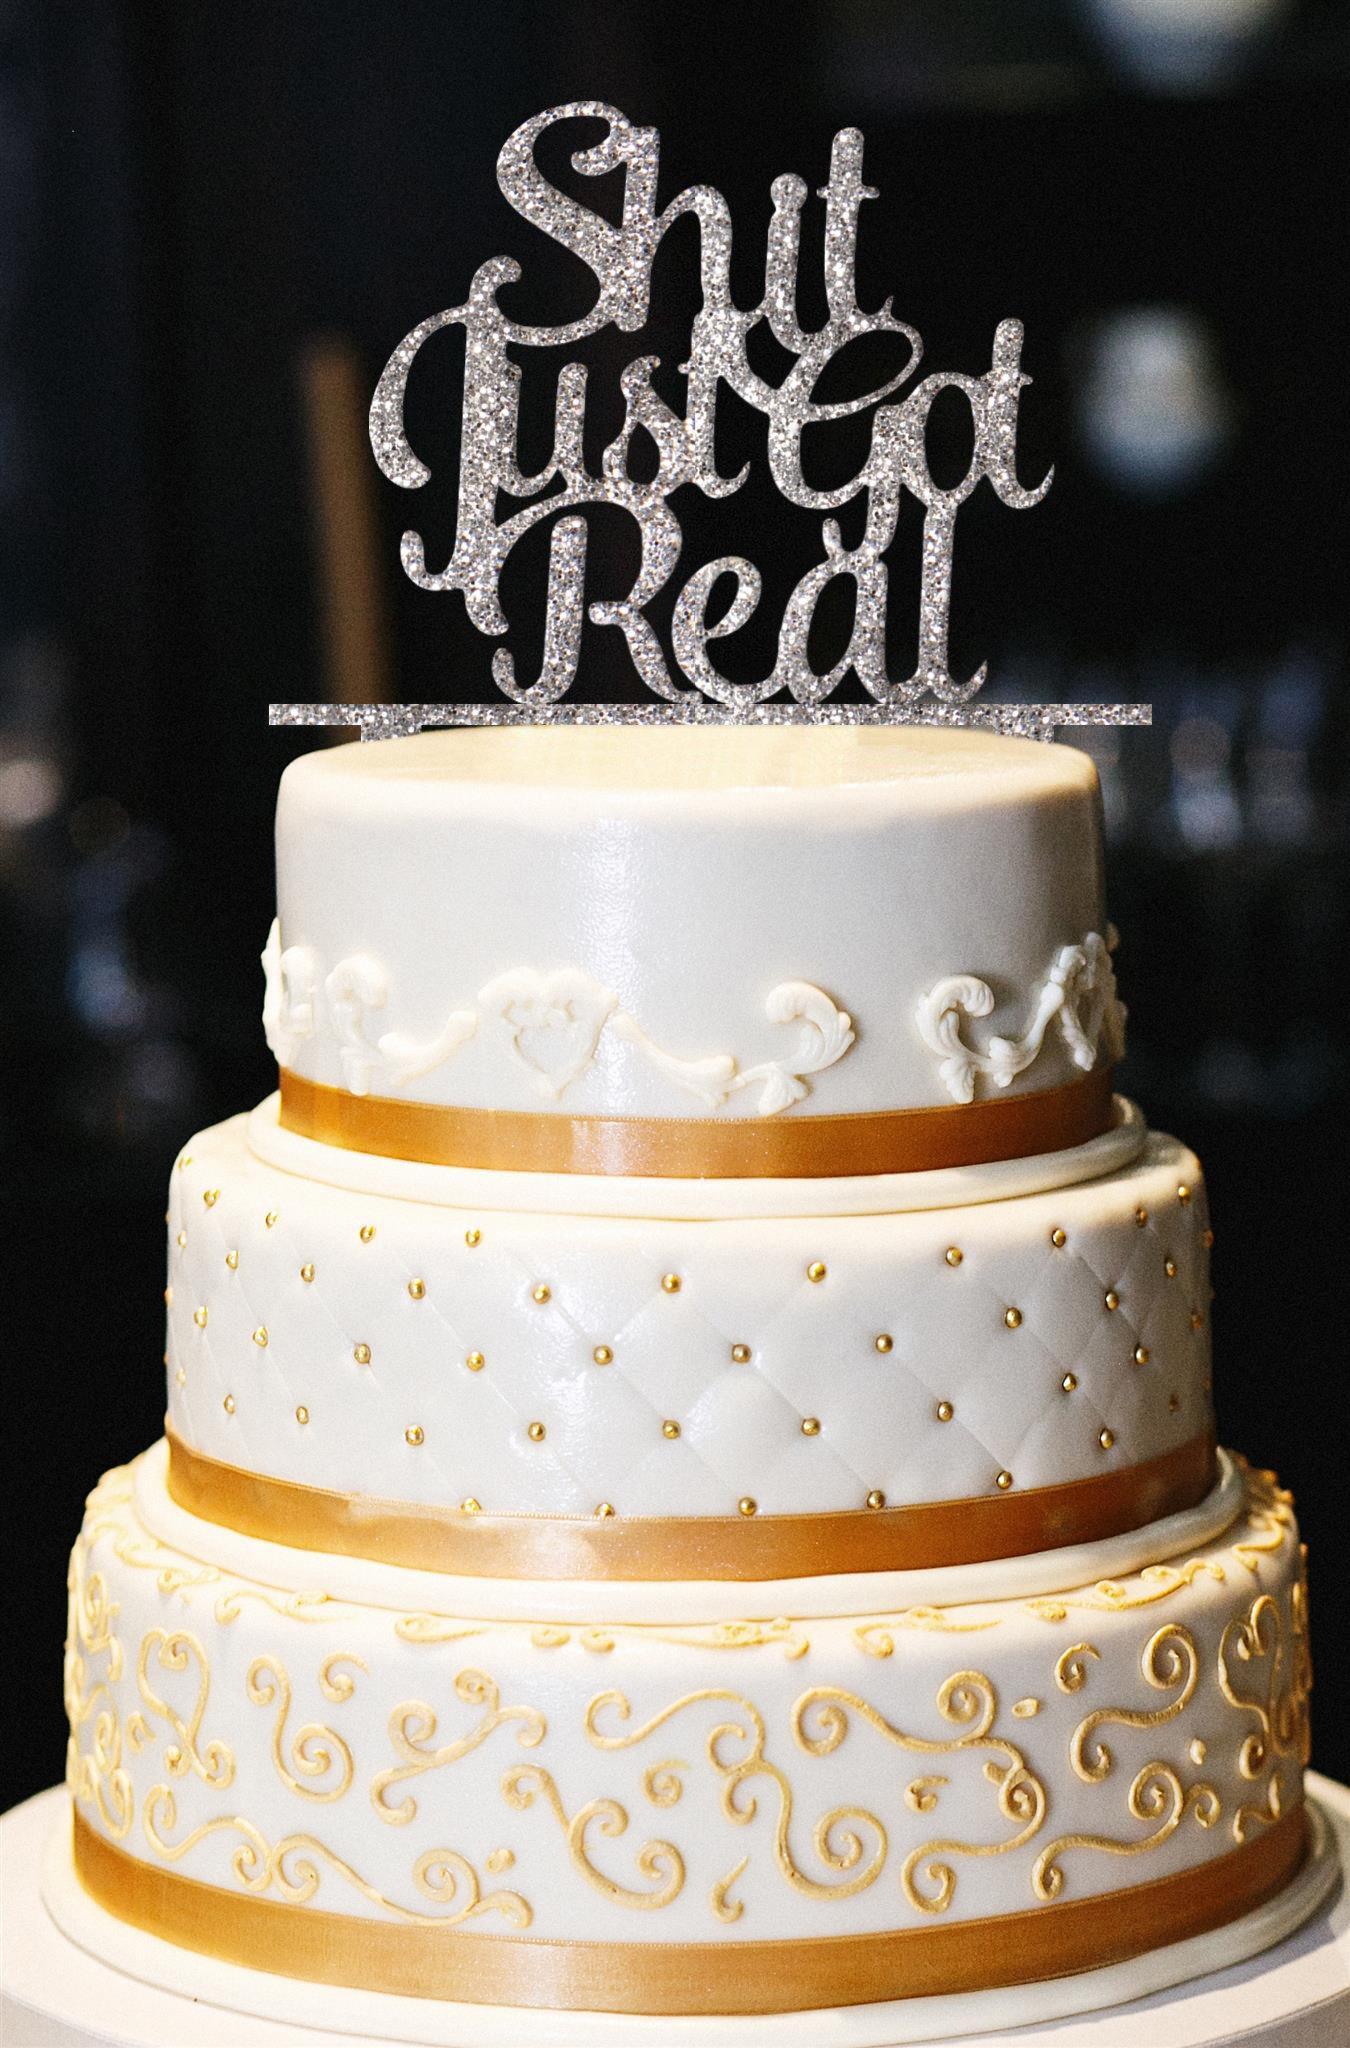 Shit Just Got Real Wedding Cake Topper, Wedding Cake Topper, Engagement Cake Topper, Funny Wedding Cake Topper, Gold Glitter Cake Topper (15'', Glitter Silver)